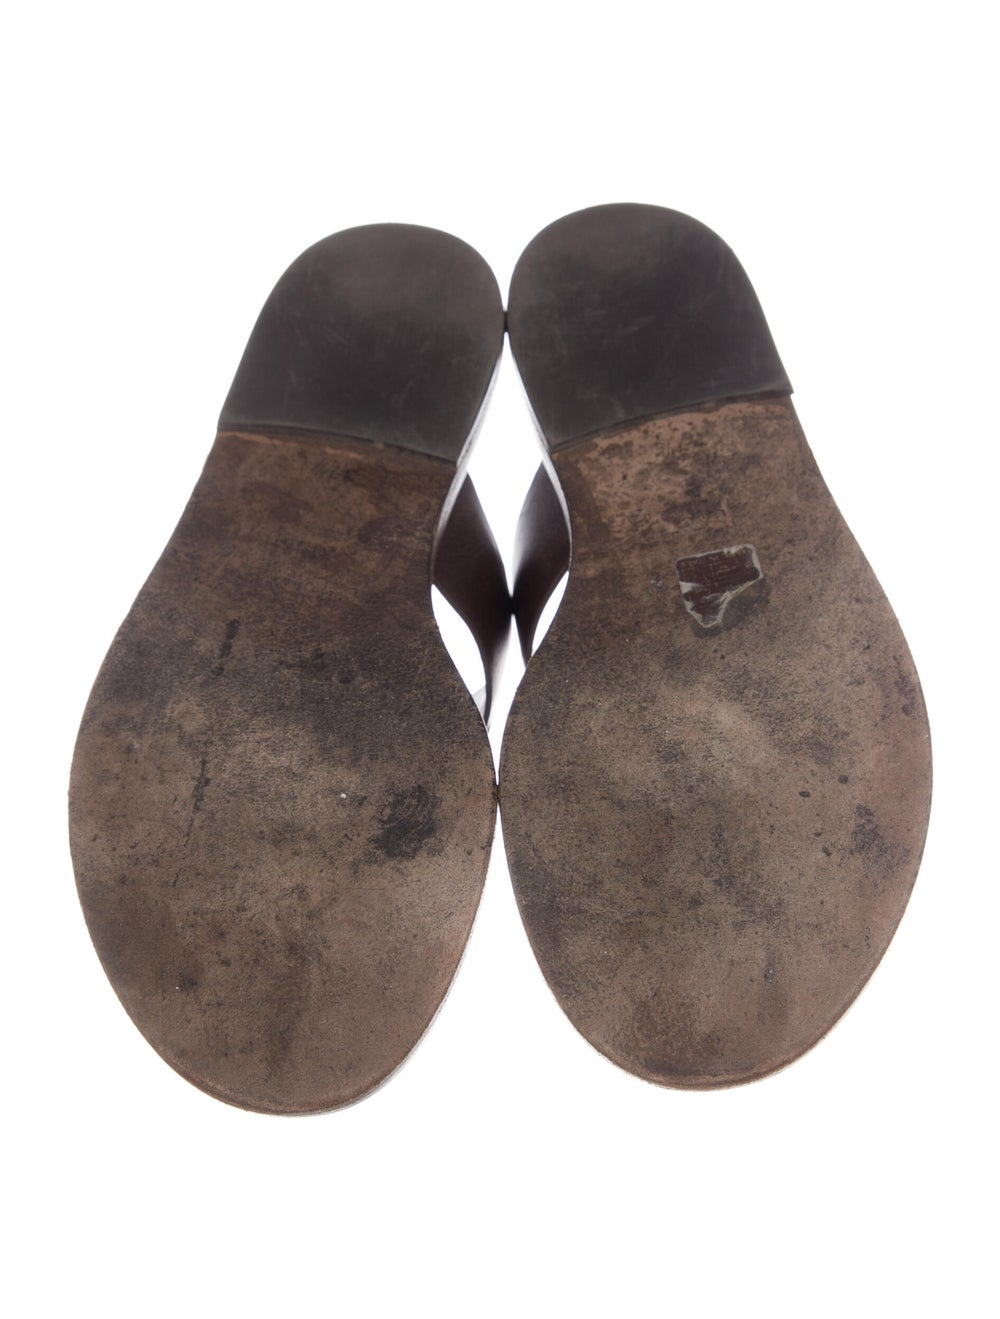 Gucci Horsebit Accent Leather Slides Brown - image 5